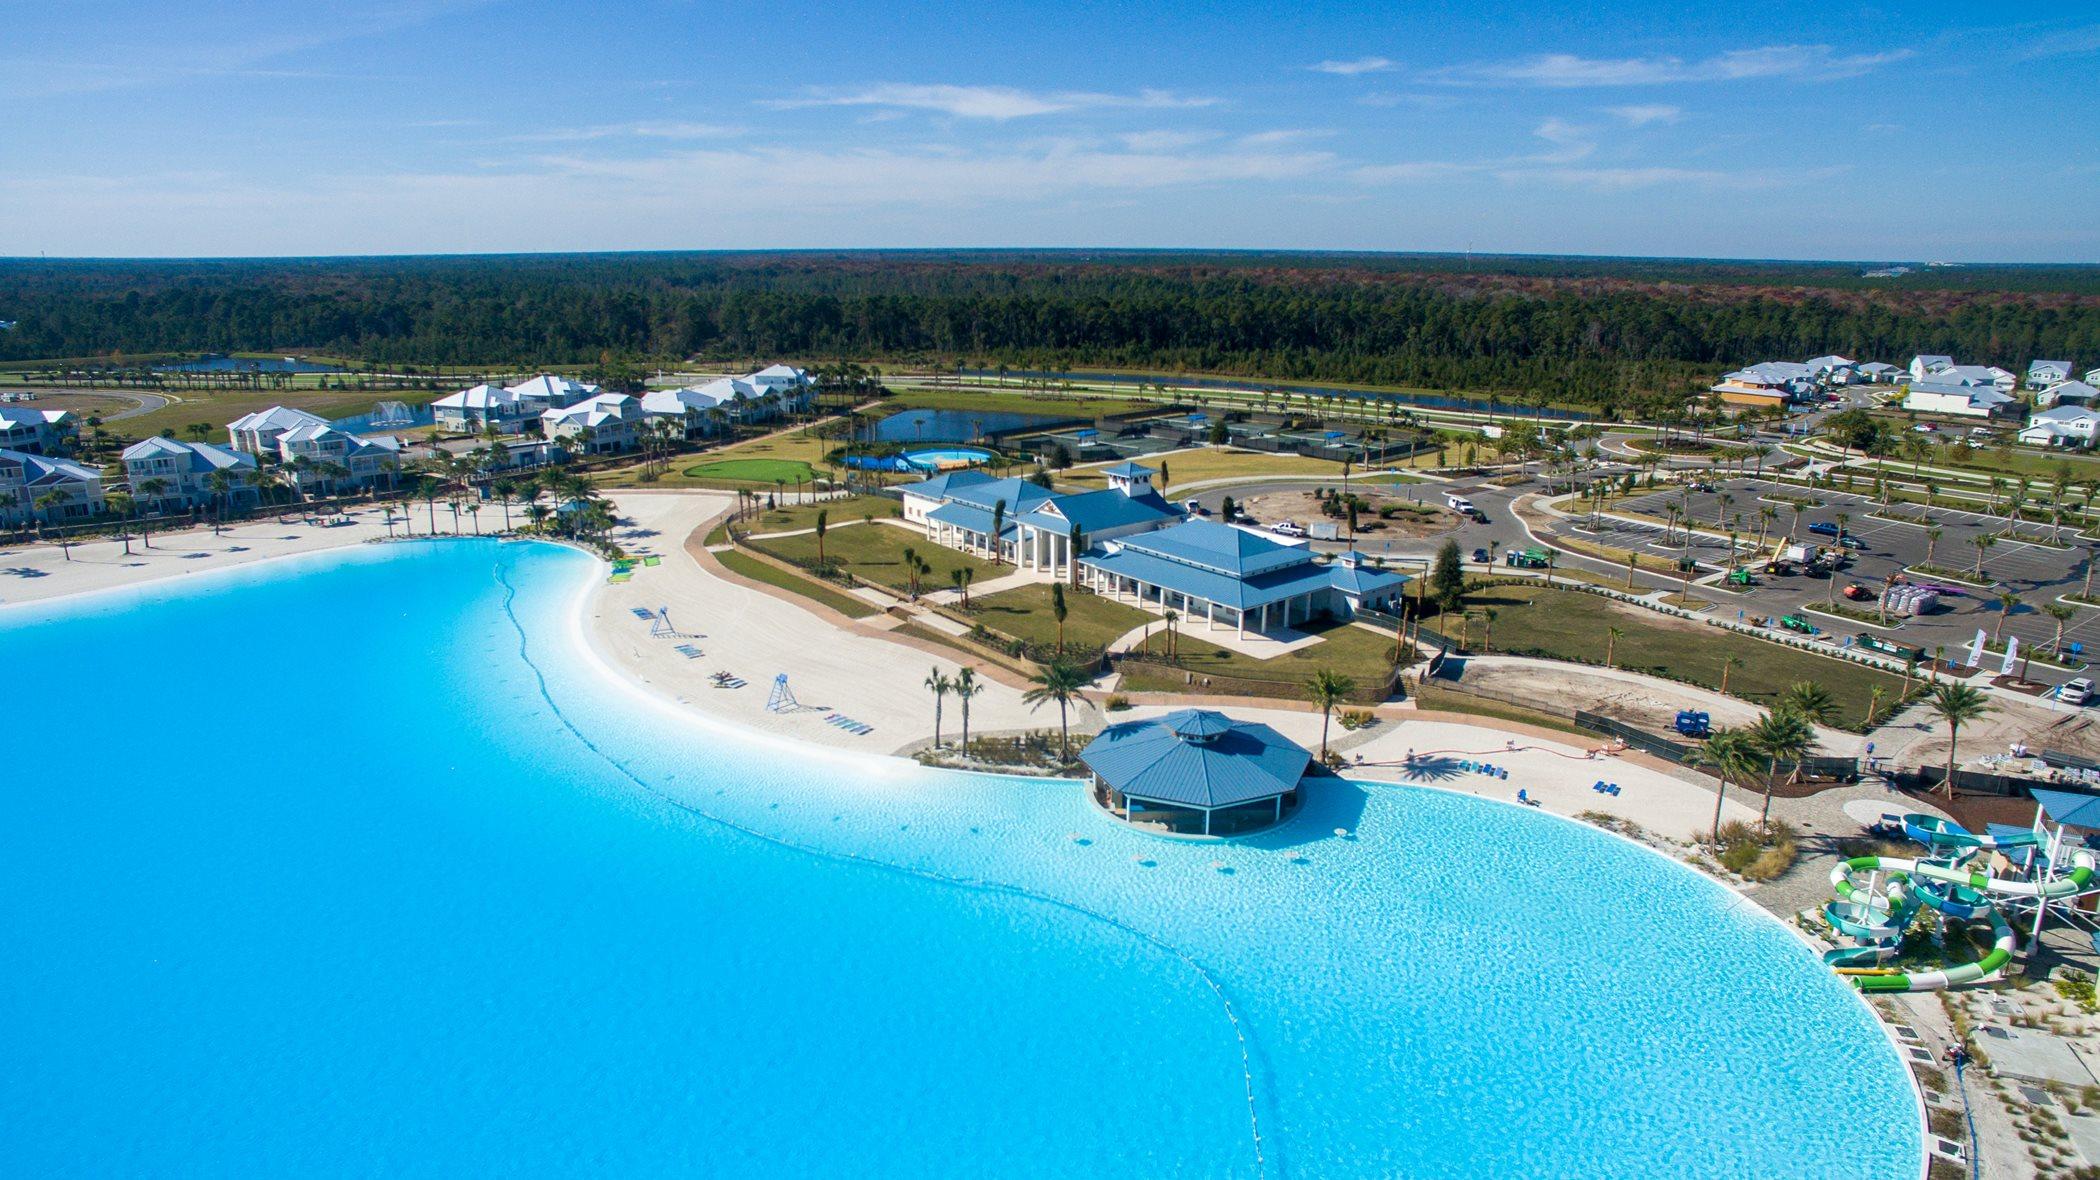 Aerial image of Beachwalk near blue lagoon